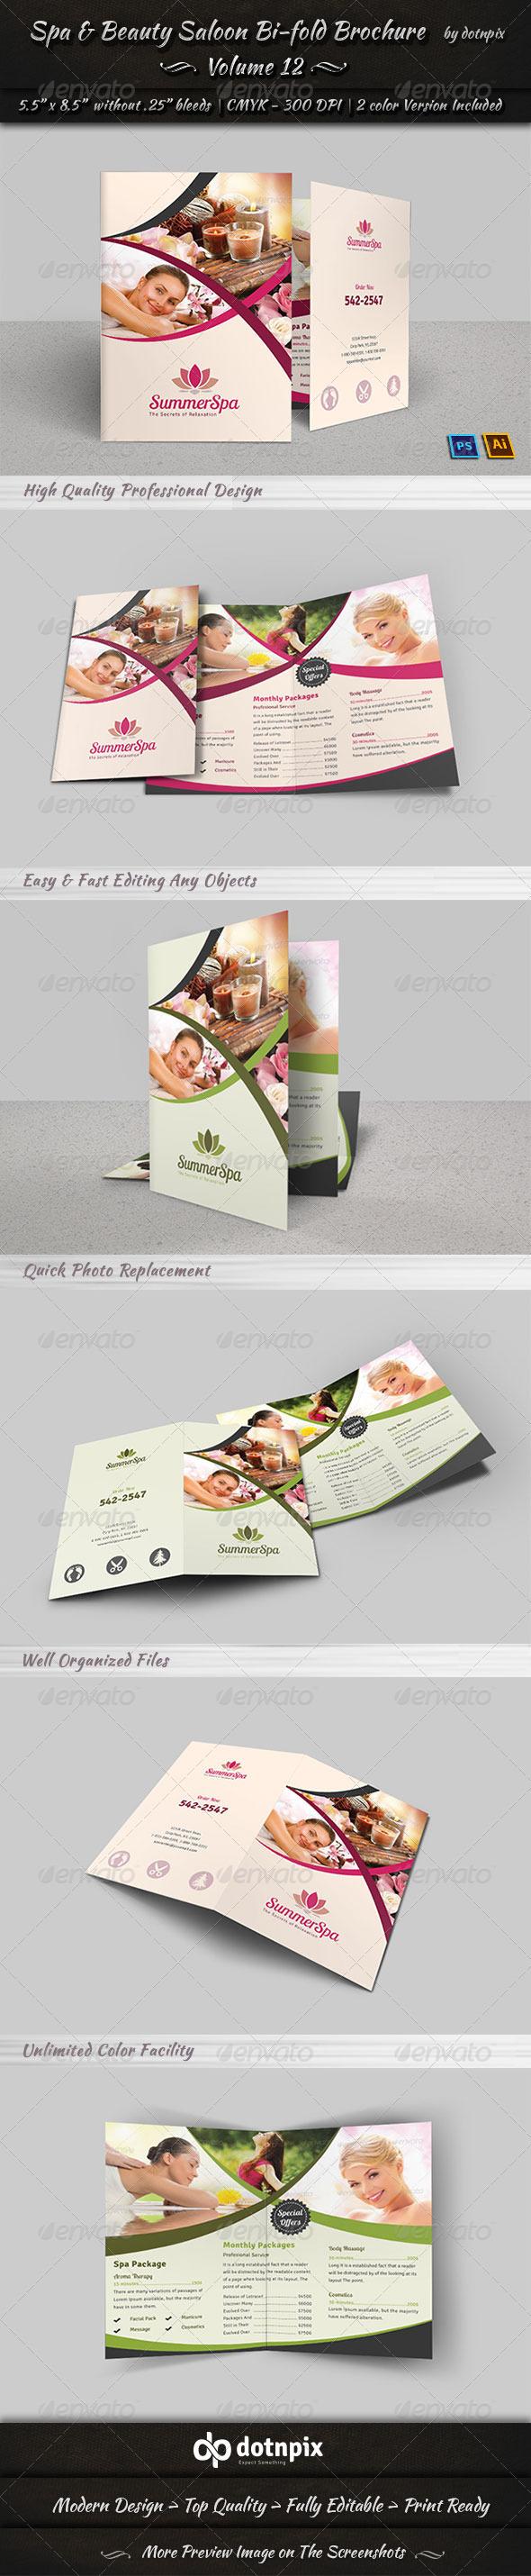 GraphicRiver Spa & Beauty Saloon Bi-fold Brochure Volume 12 7968819